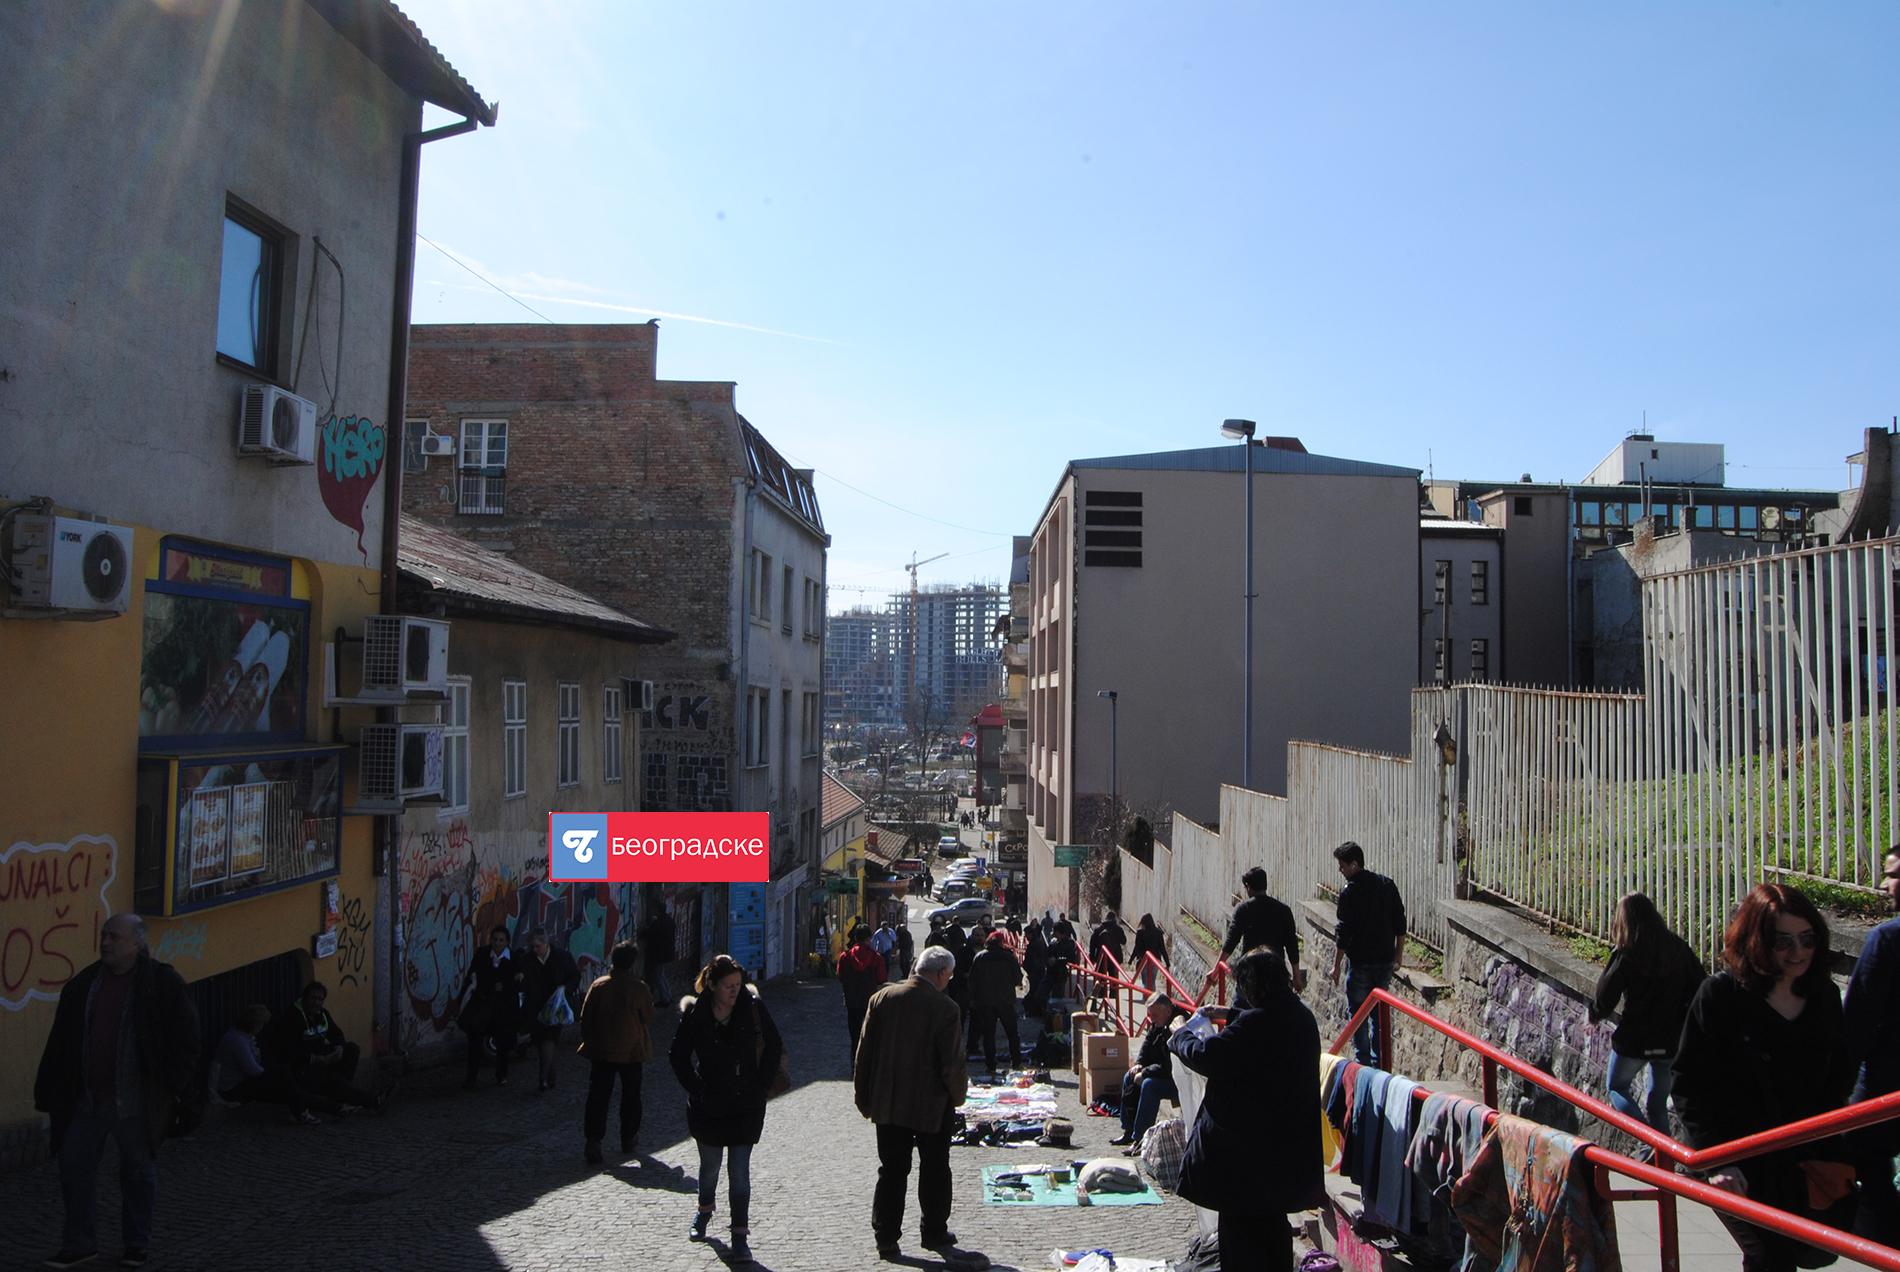 Београд на води из Каменичке улице Фото: Милош Старчевић